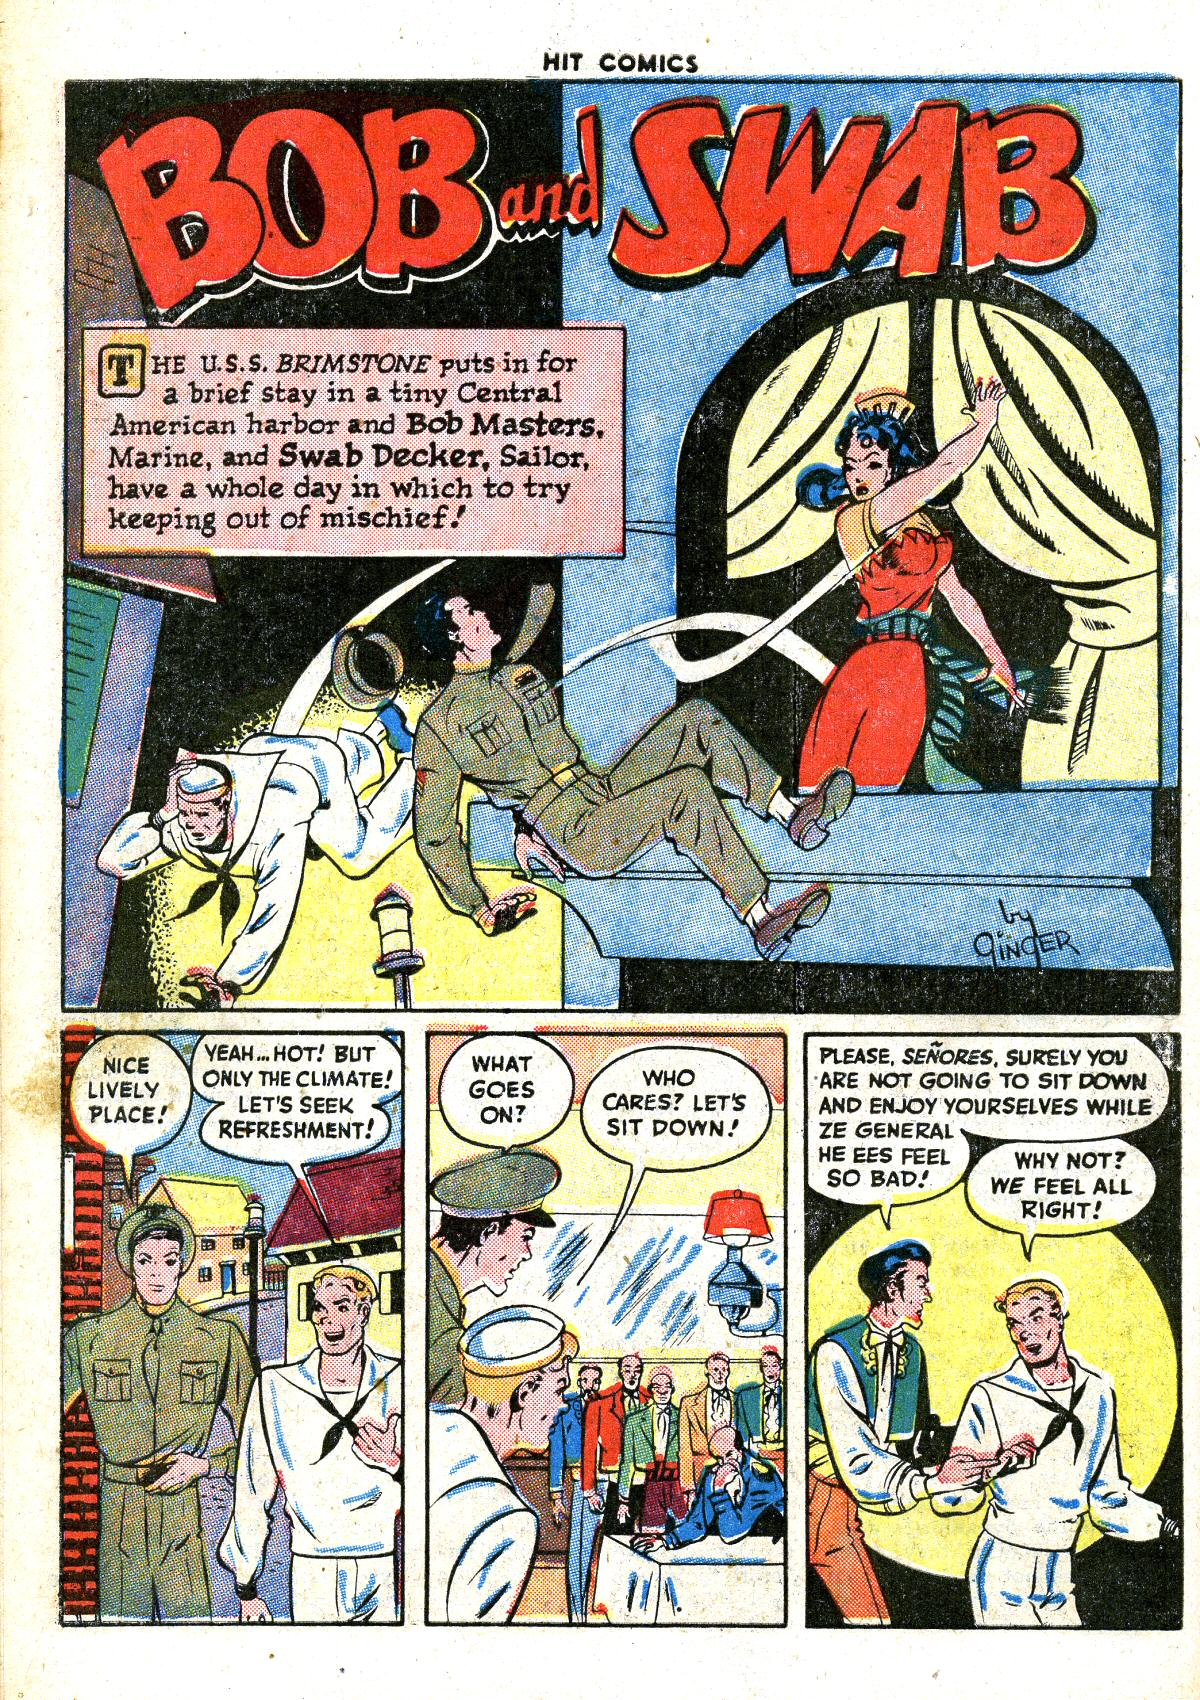 Read online Hit Comics comic -  Issue #41 - 46